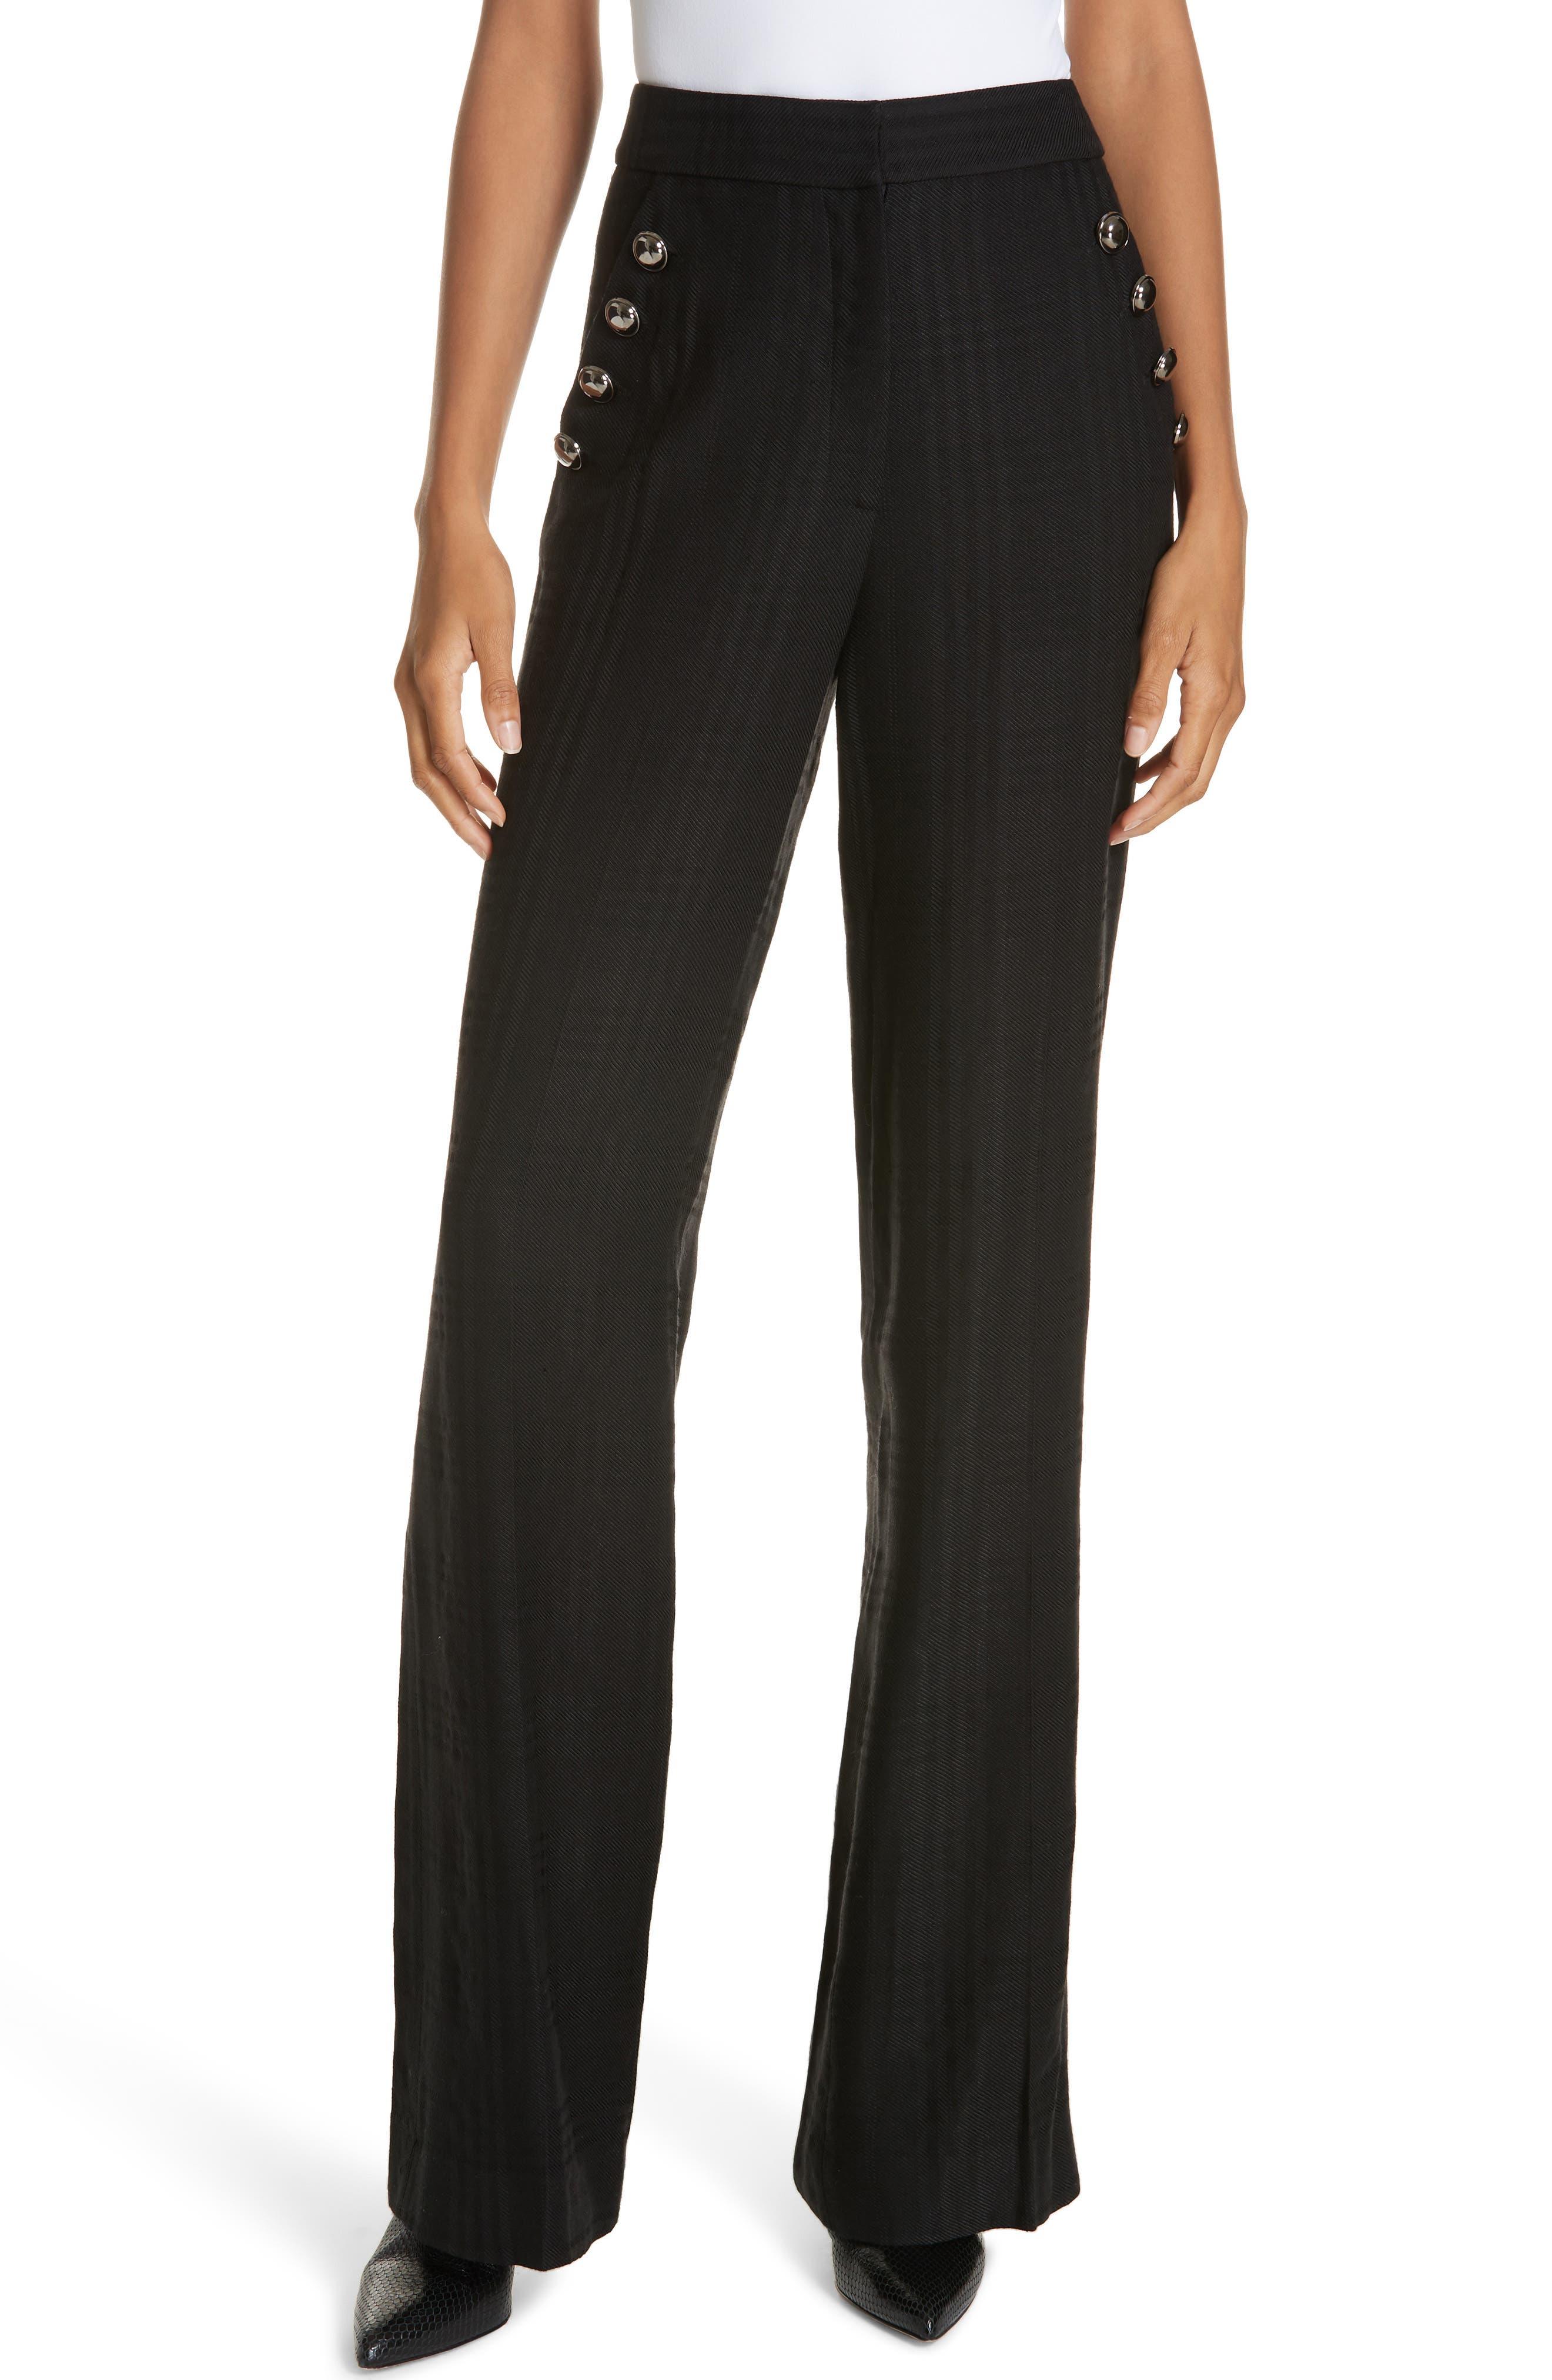 Tuli Check Button Detail Pants,                             Main thumbnail 1, color,                             BLACK/ BLACK